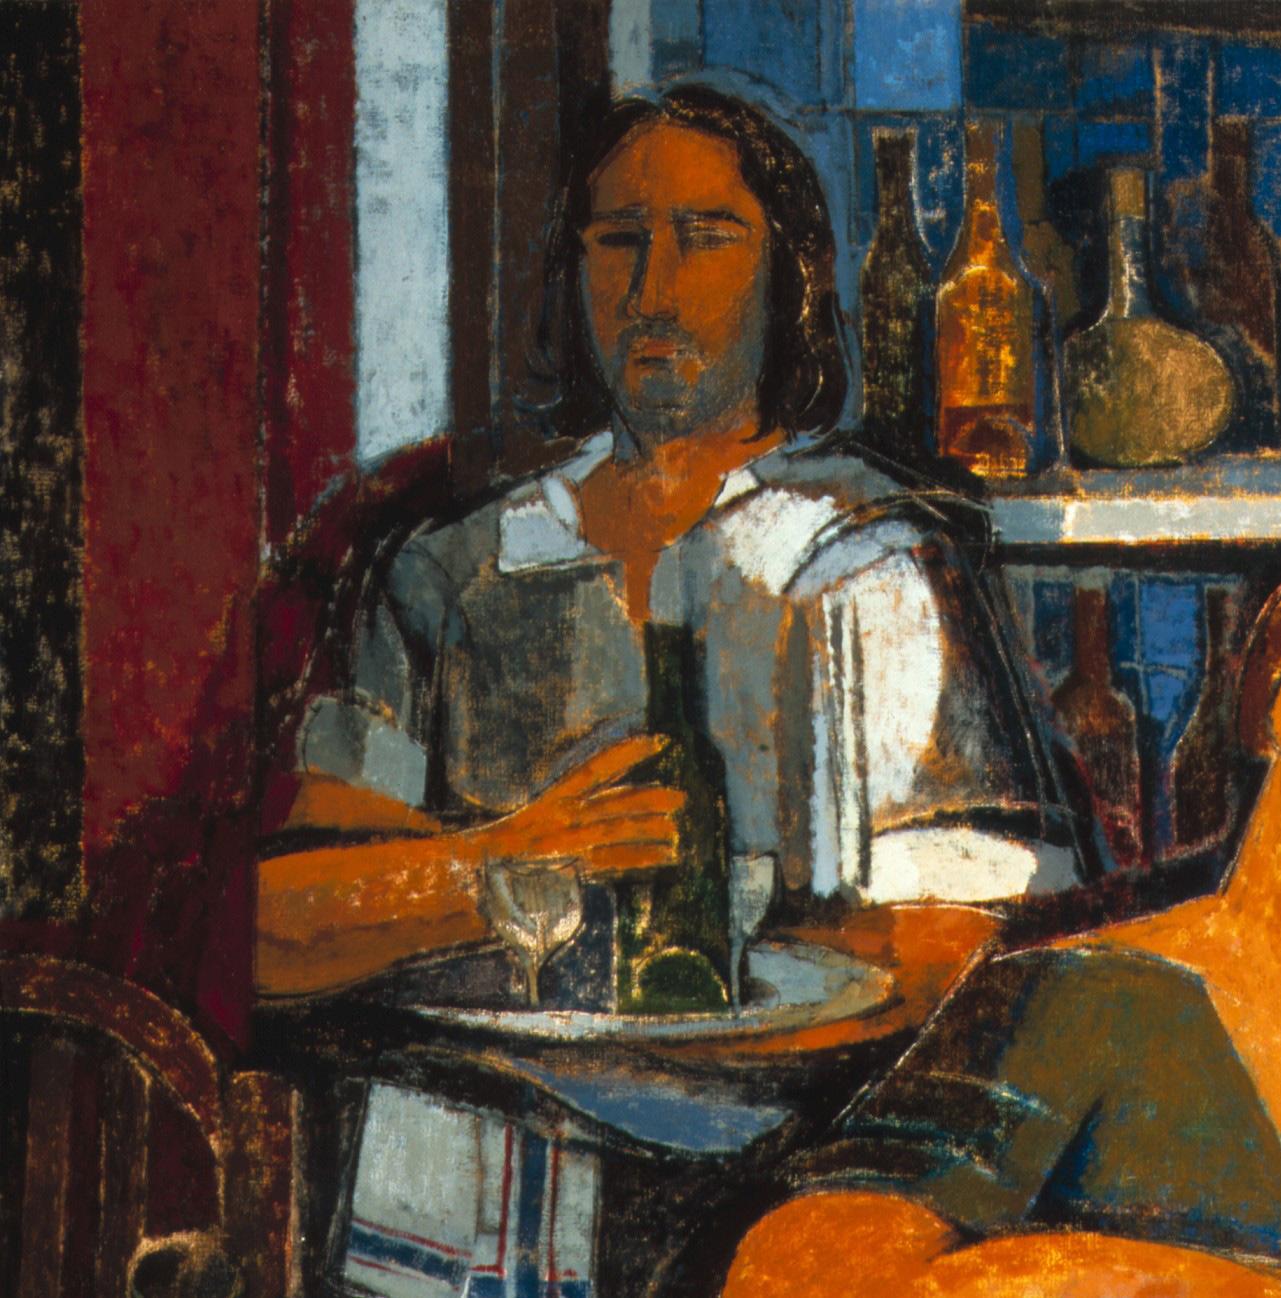 1997 Liberty Pub, Frangmento